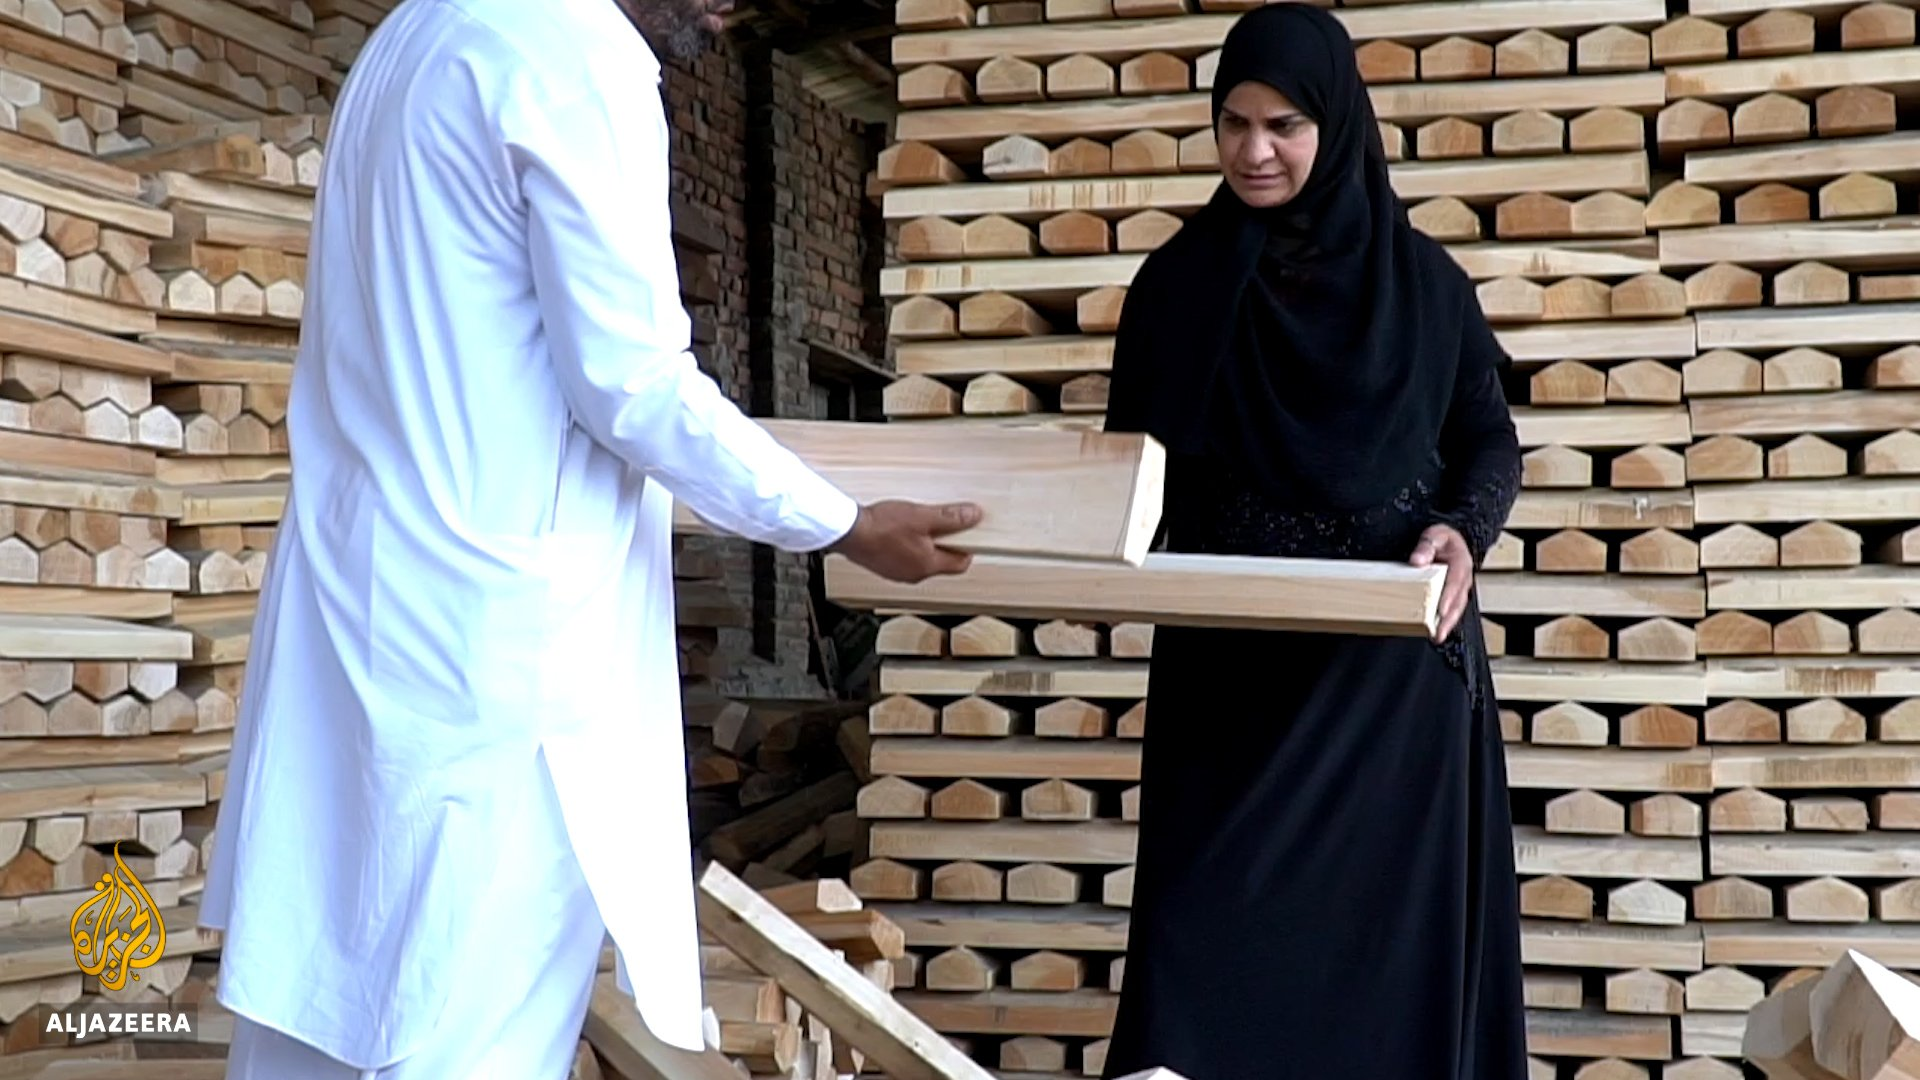 Men dominate cricket bat production in Kashmir, but Rifat Masoodi is hitting back for women. https://t.co/6SgXkHoXAh